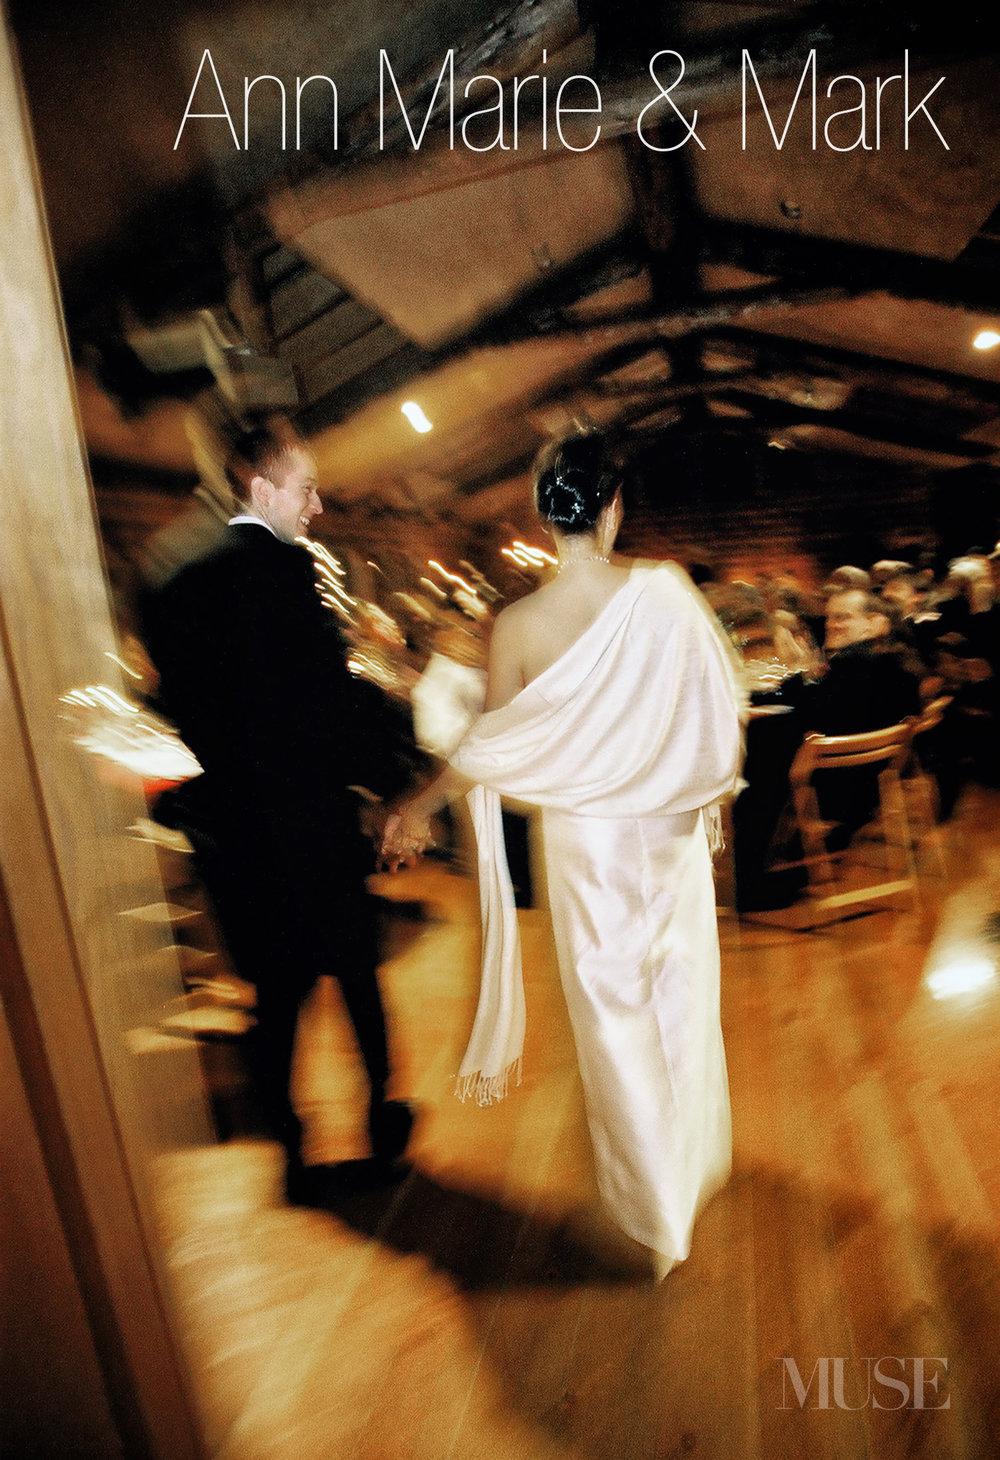 MUSE Bride Lookbook - Brides . Ann Marie